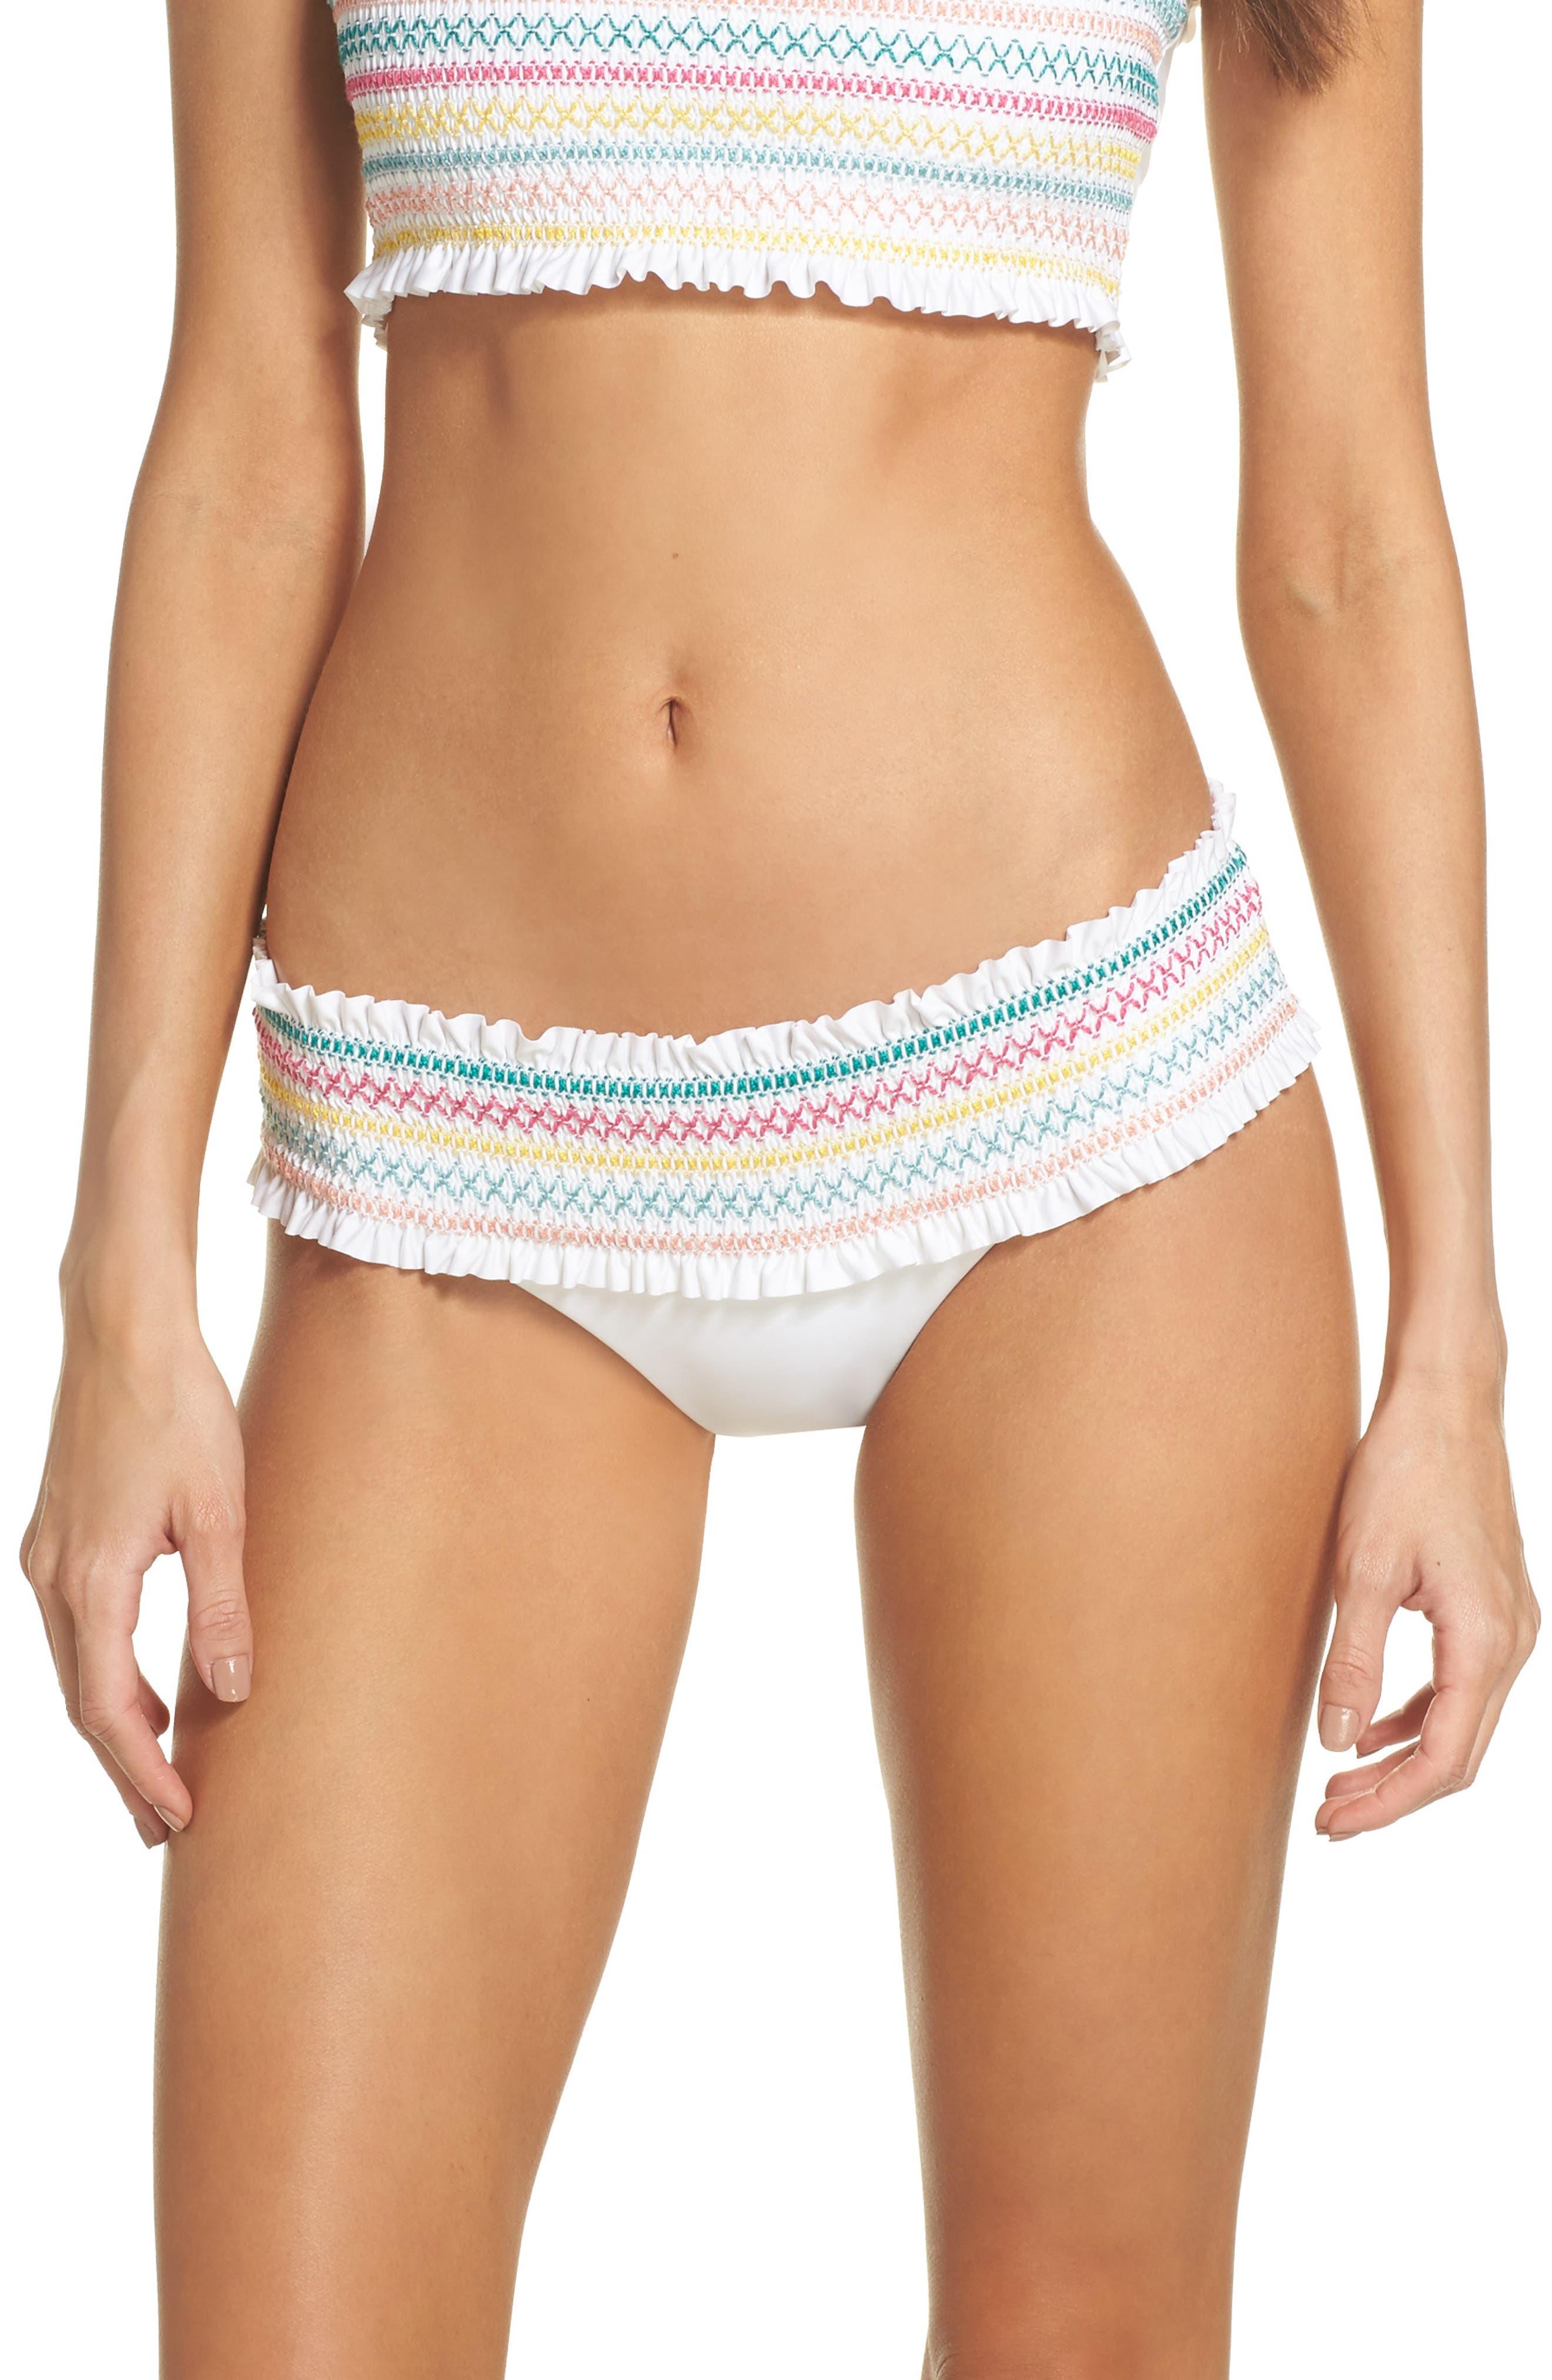 Crystal Cove Smocked Bikini Bottoms,                             Main thumbnail 1, color,                             100